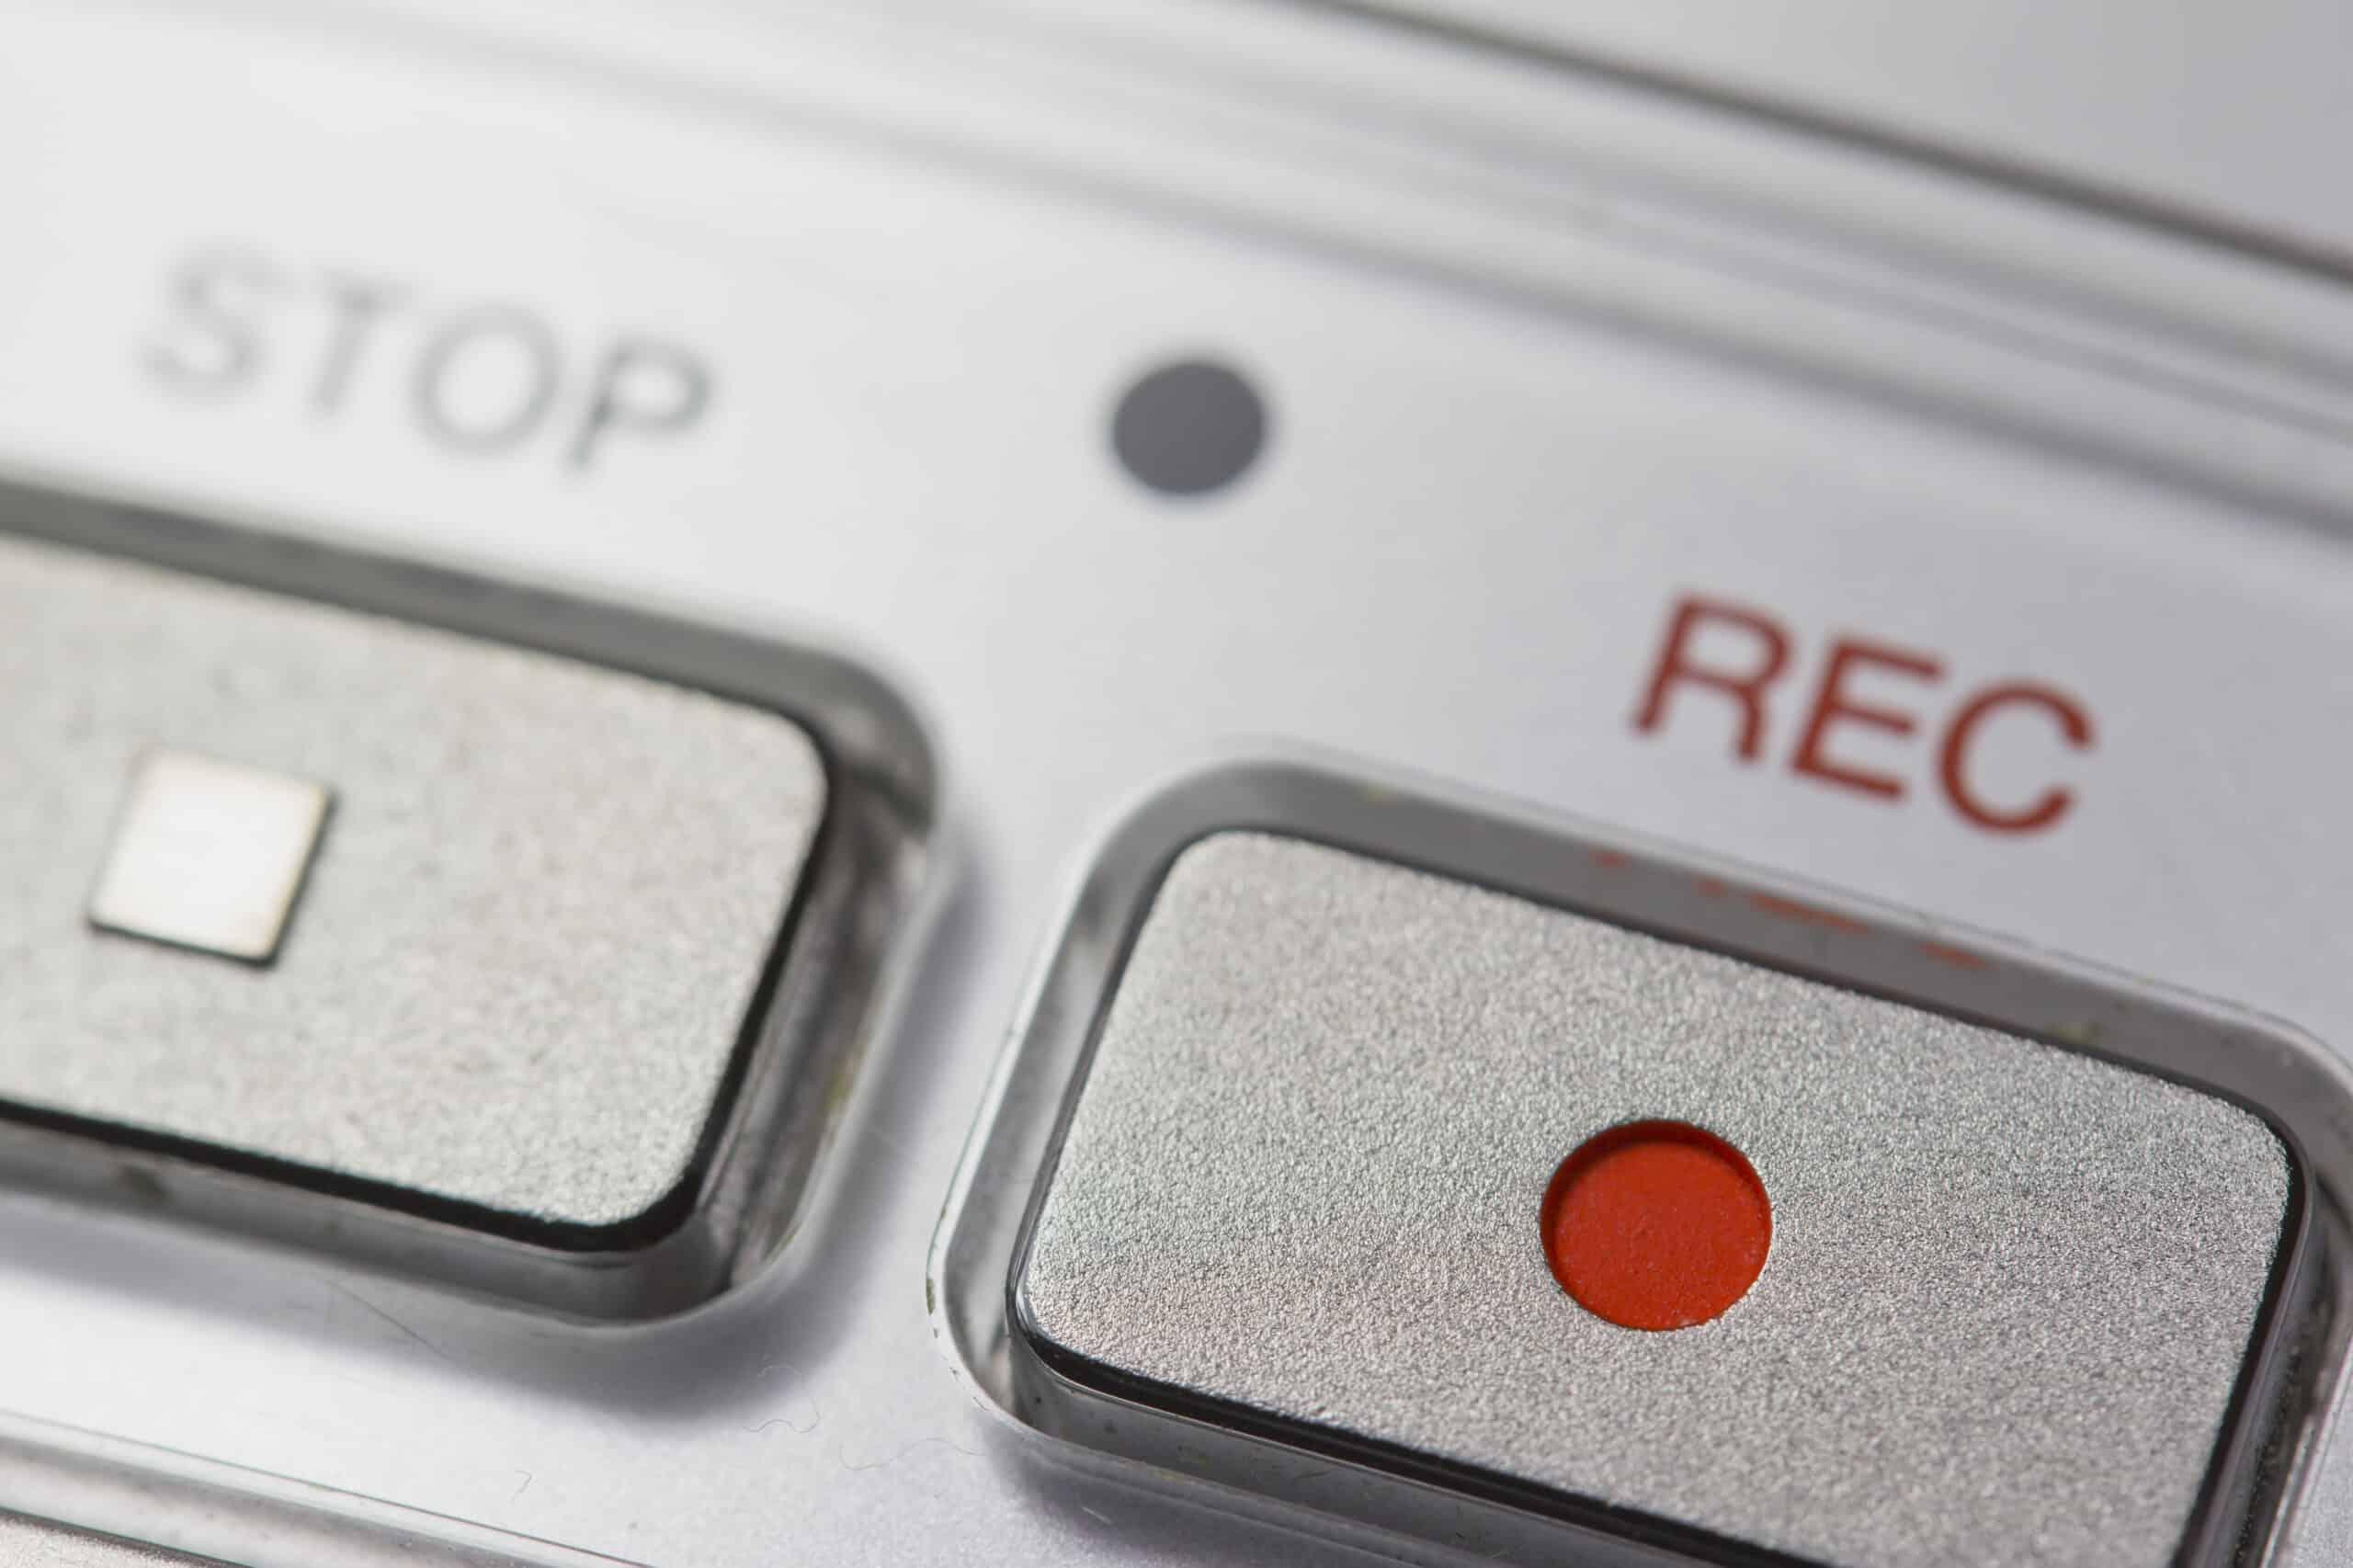 Nahrávací REC tlačítko